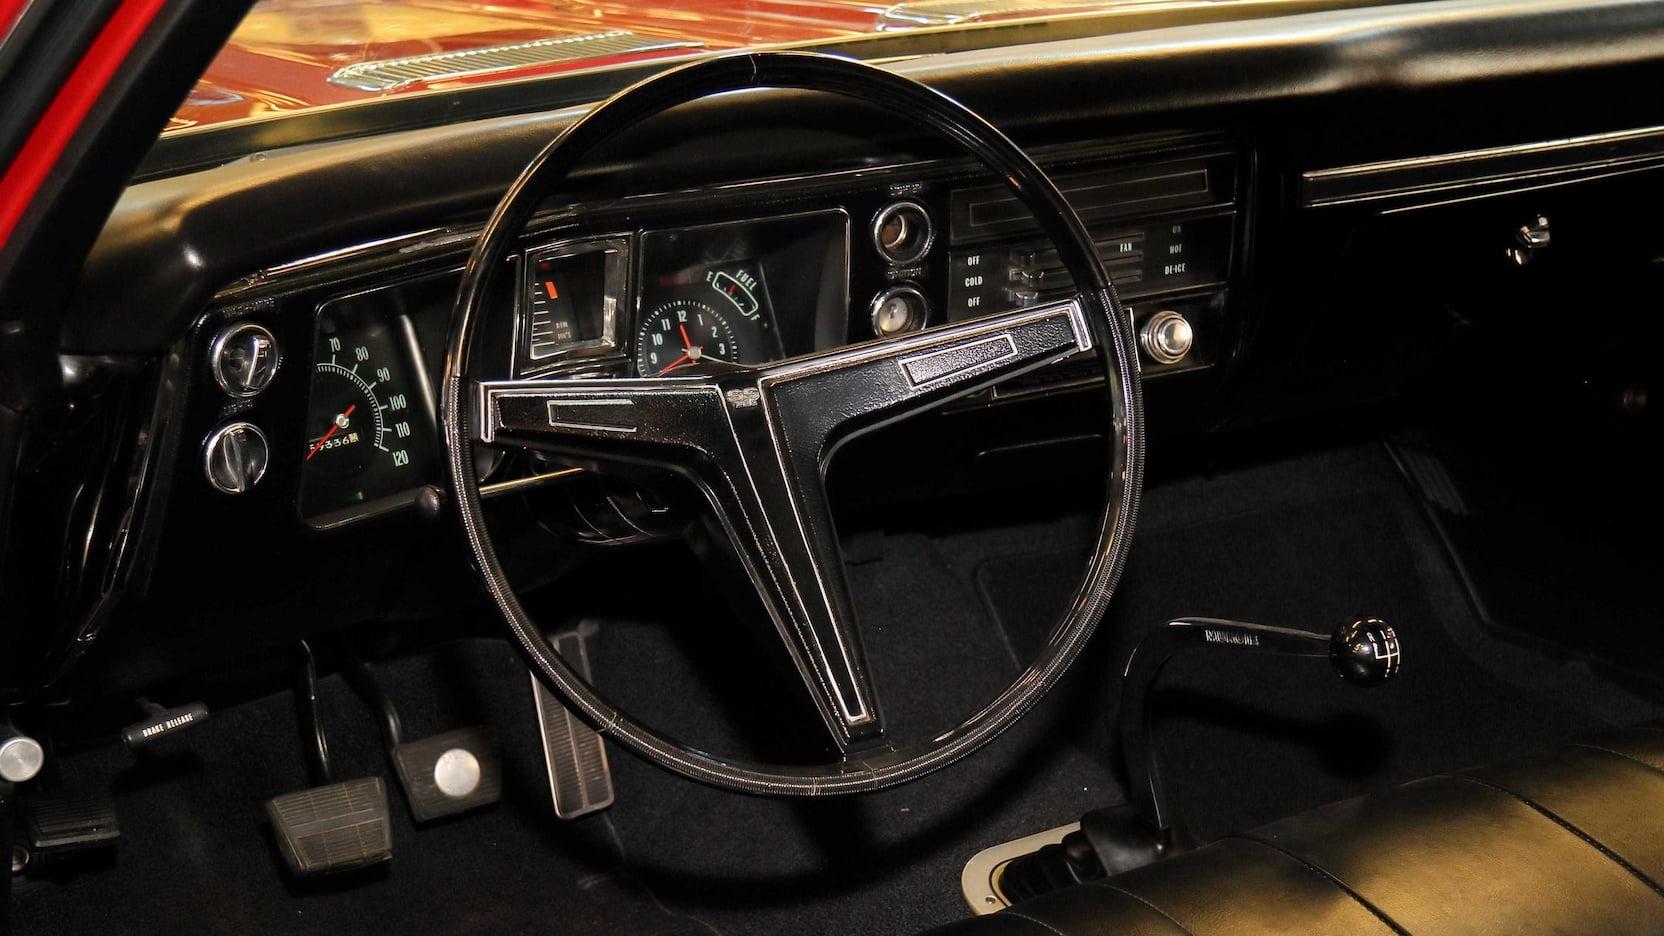 1968 CHEVROLET CHEVELLE SS L89